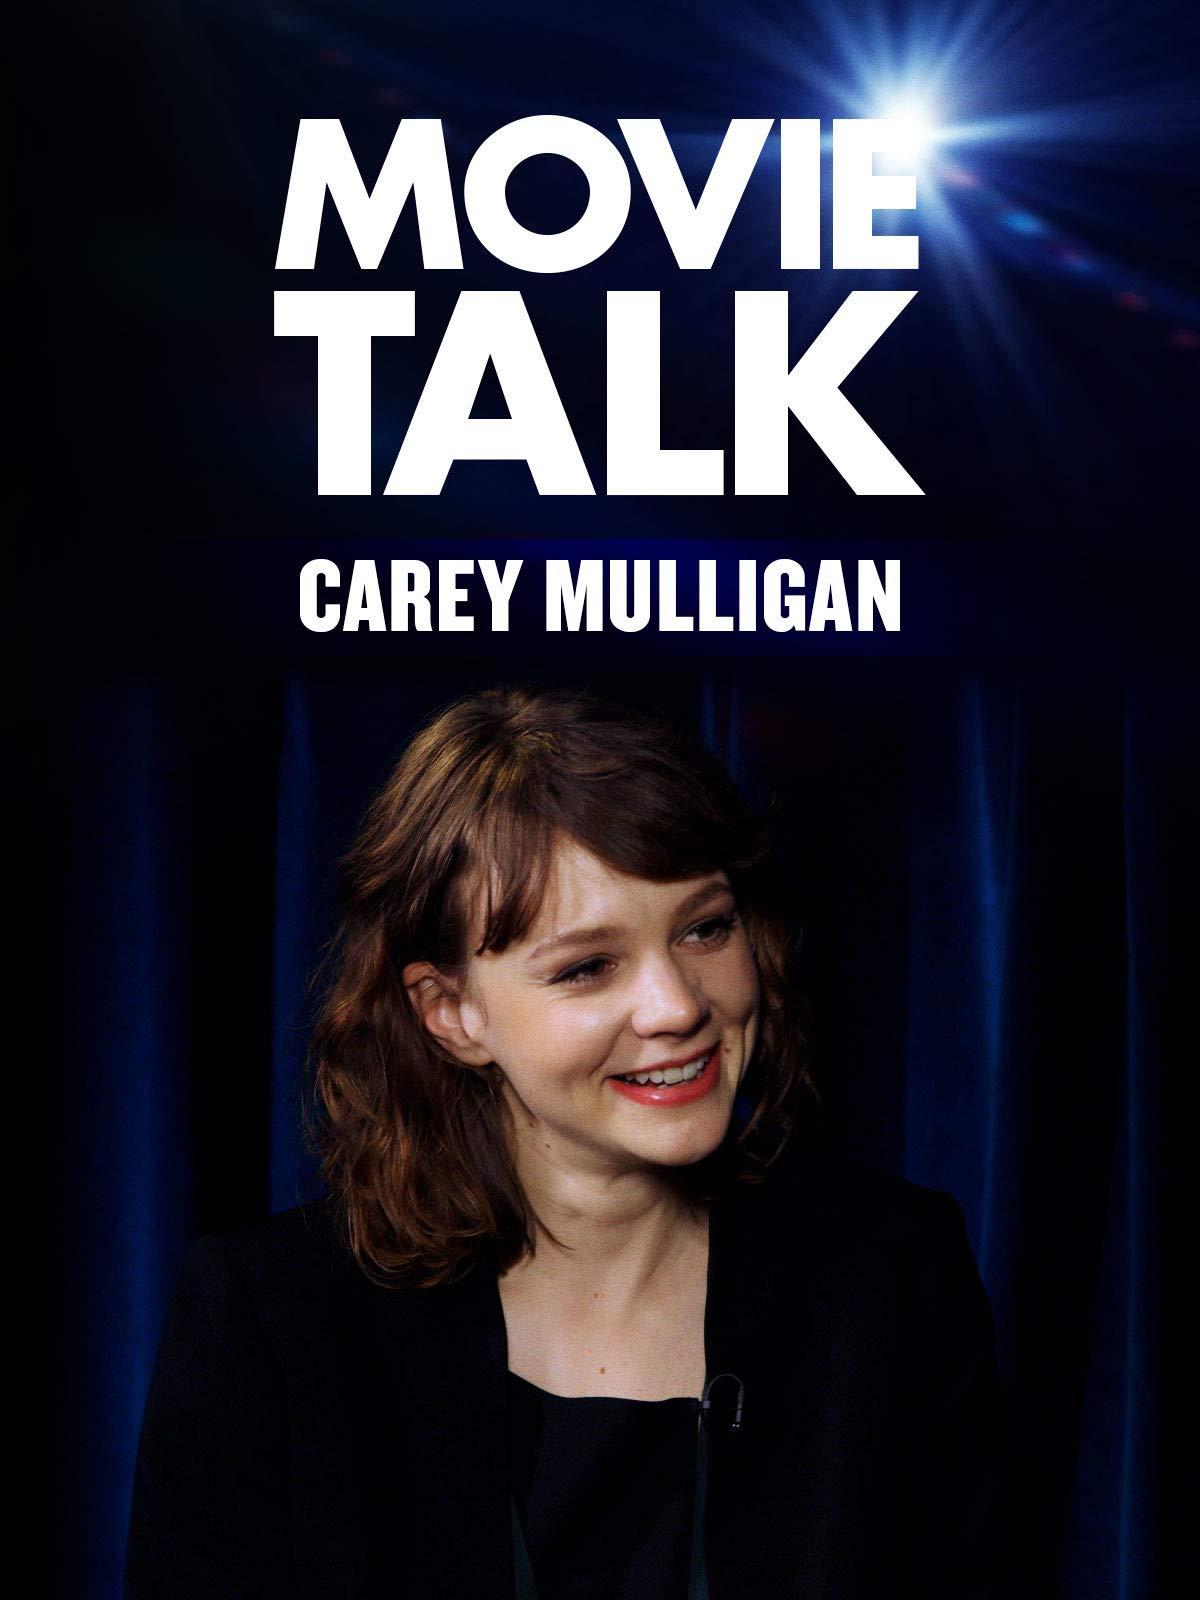 Carey Mulligan - Movie Talk on Amazon Prime Video UK